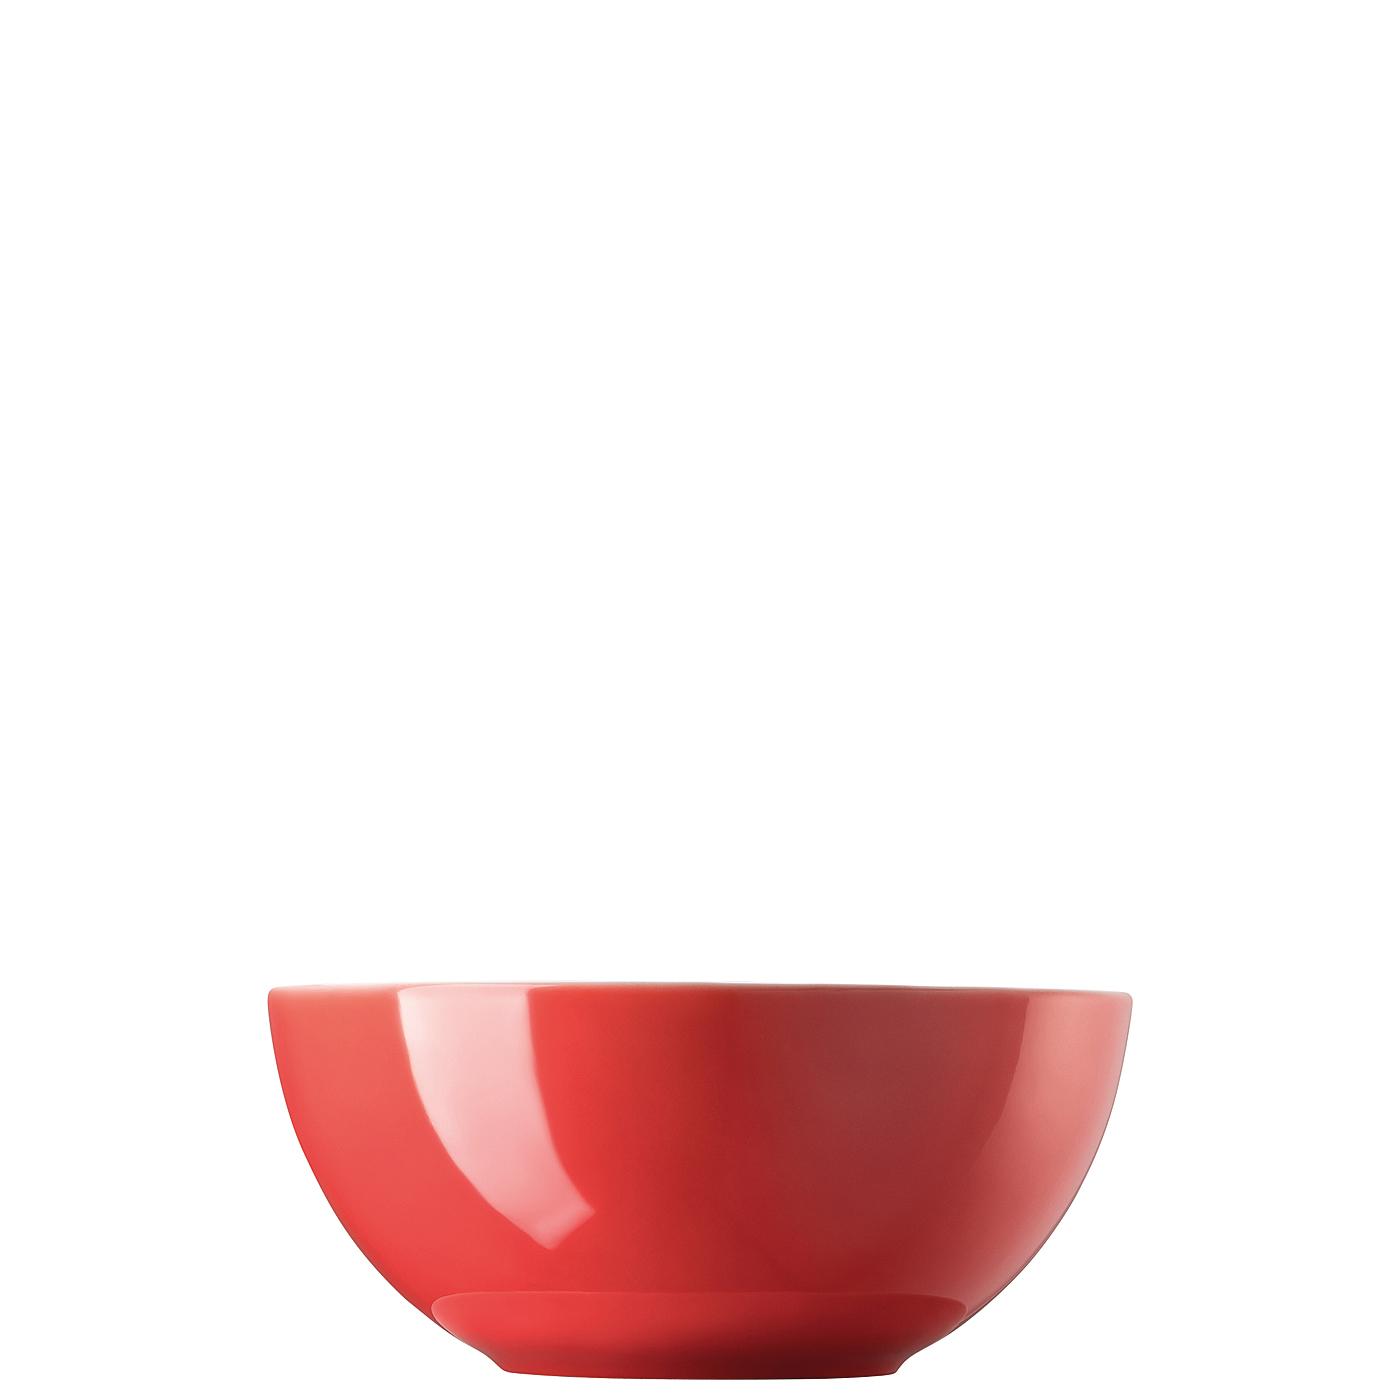 Schüssel 21 cm Sunny Day New Red Thomas Porzellan